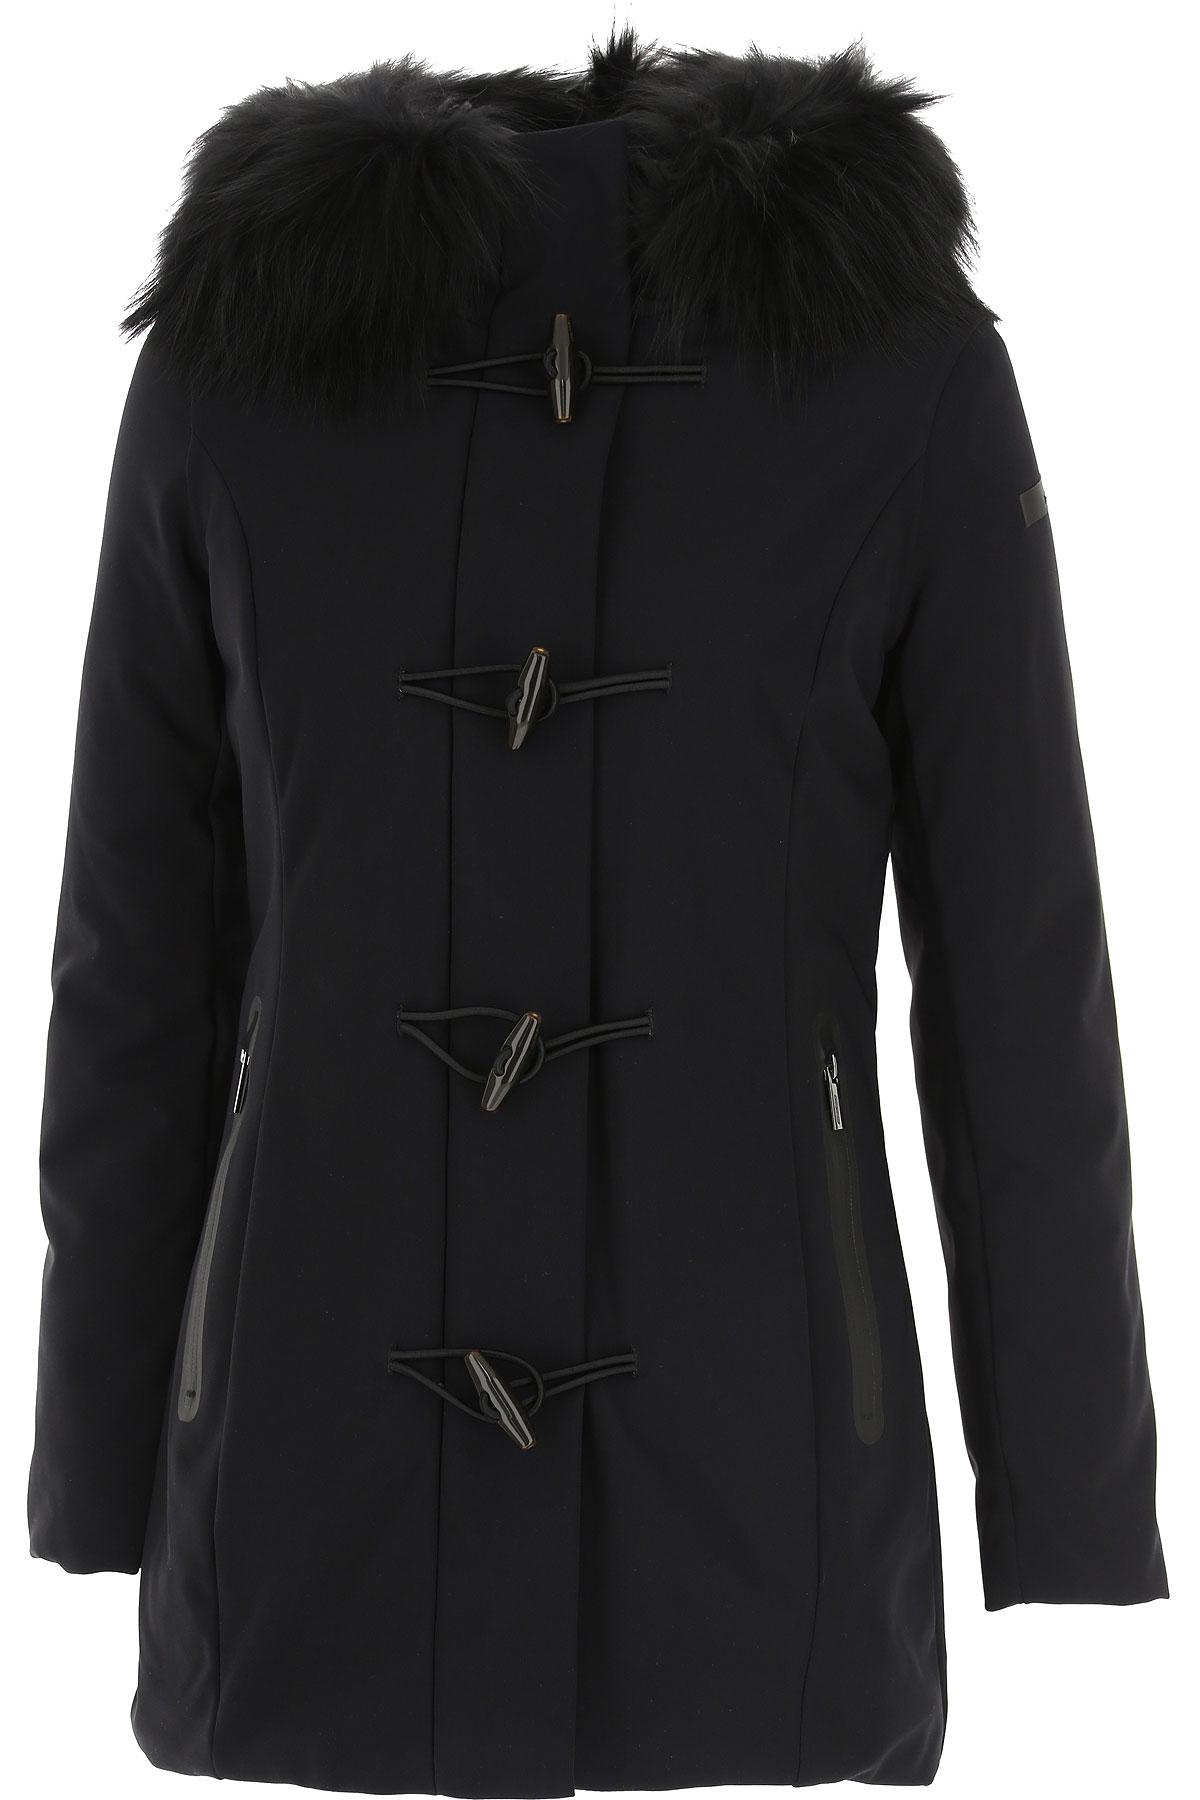 RRD Down Jacket for Women, Puffer Ski Jacket On Sale, Black, Down, 2019, 4 6 8